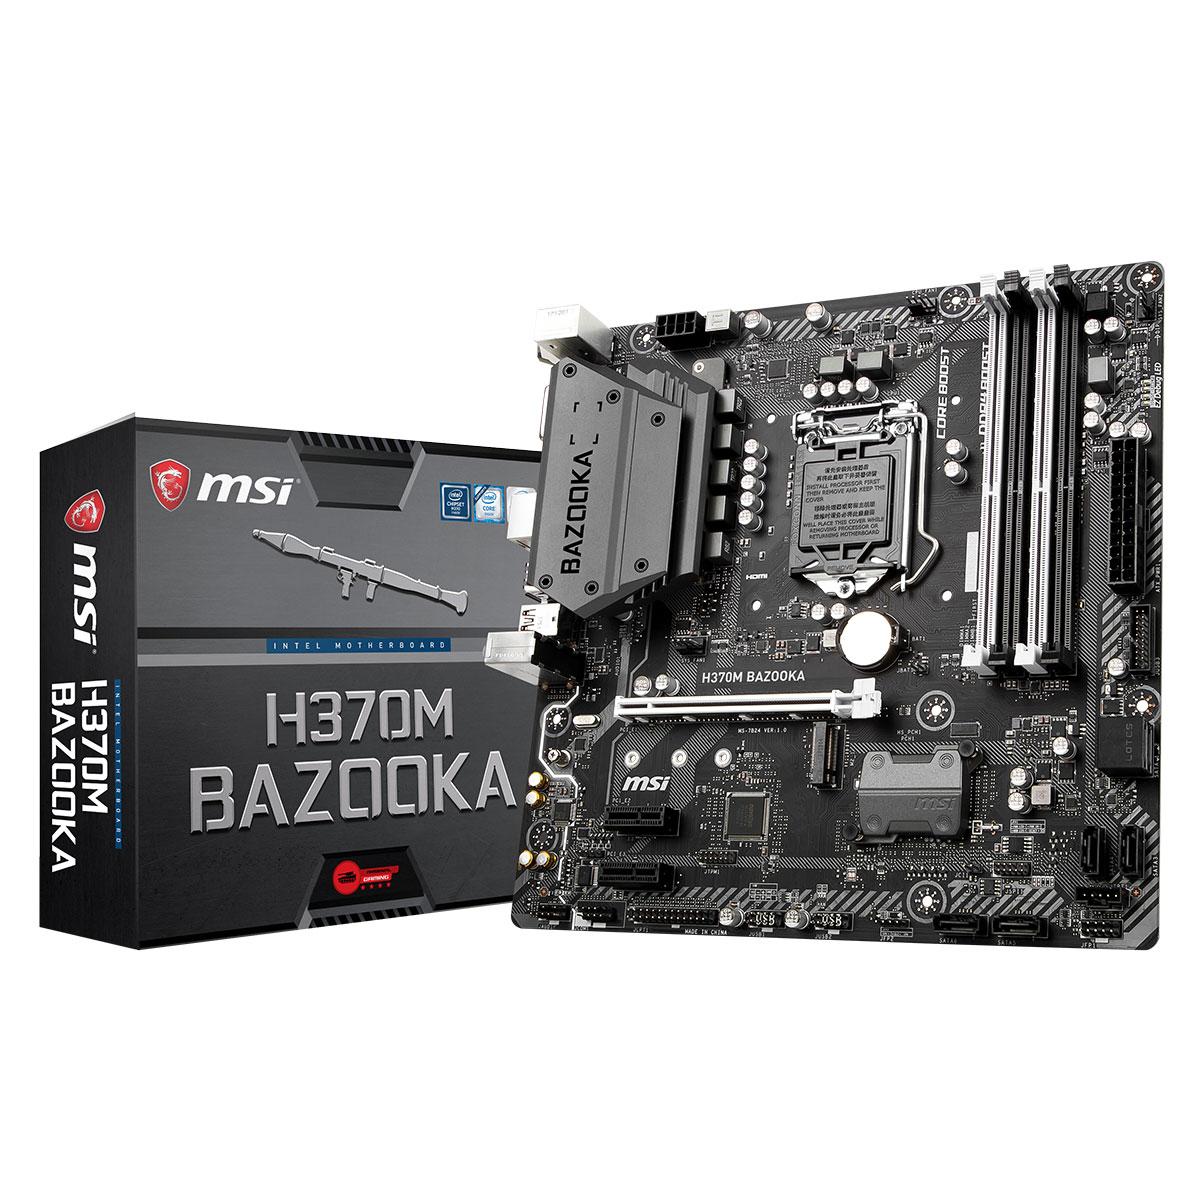 MSI H370M BAZOOKA Micro-ATX DDR4 - Carte mère MSI - Cybertek.fr - 0